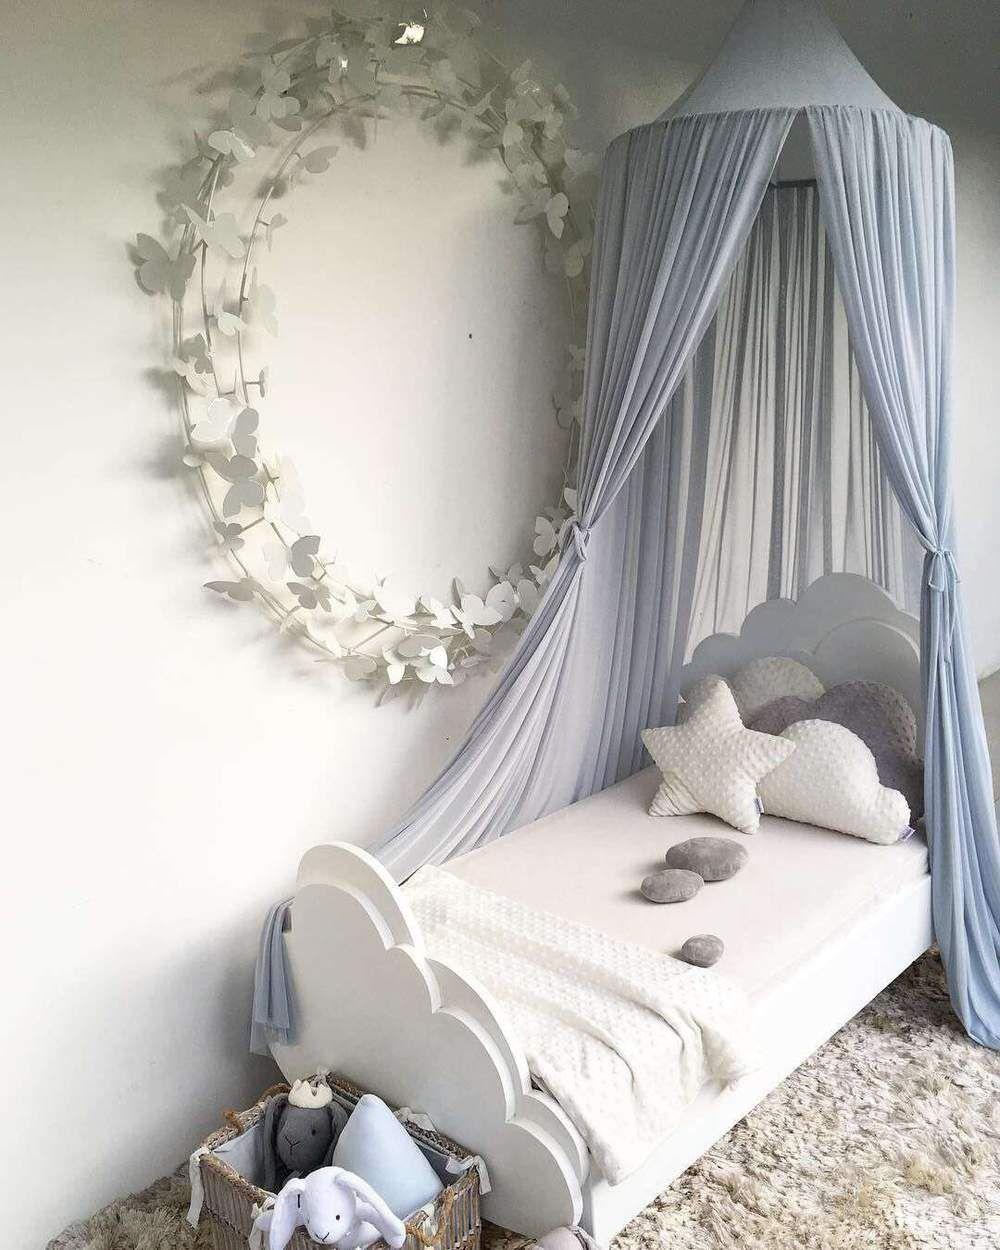 chiffon bed canopy on princess chiffon bed canopy 5 colors kids bed canopy princess canopy bed kid room decor pinterest